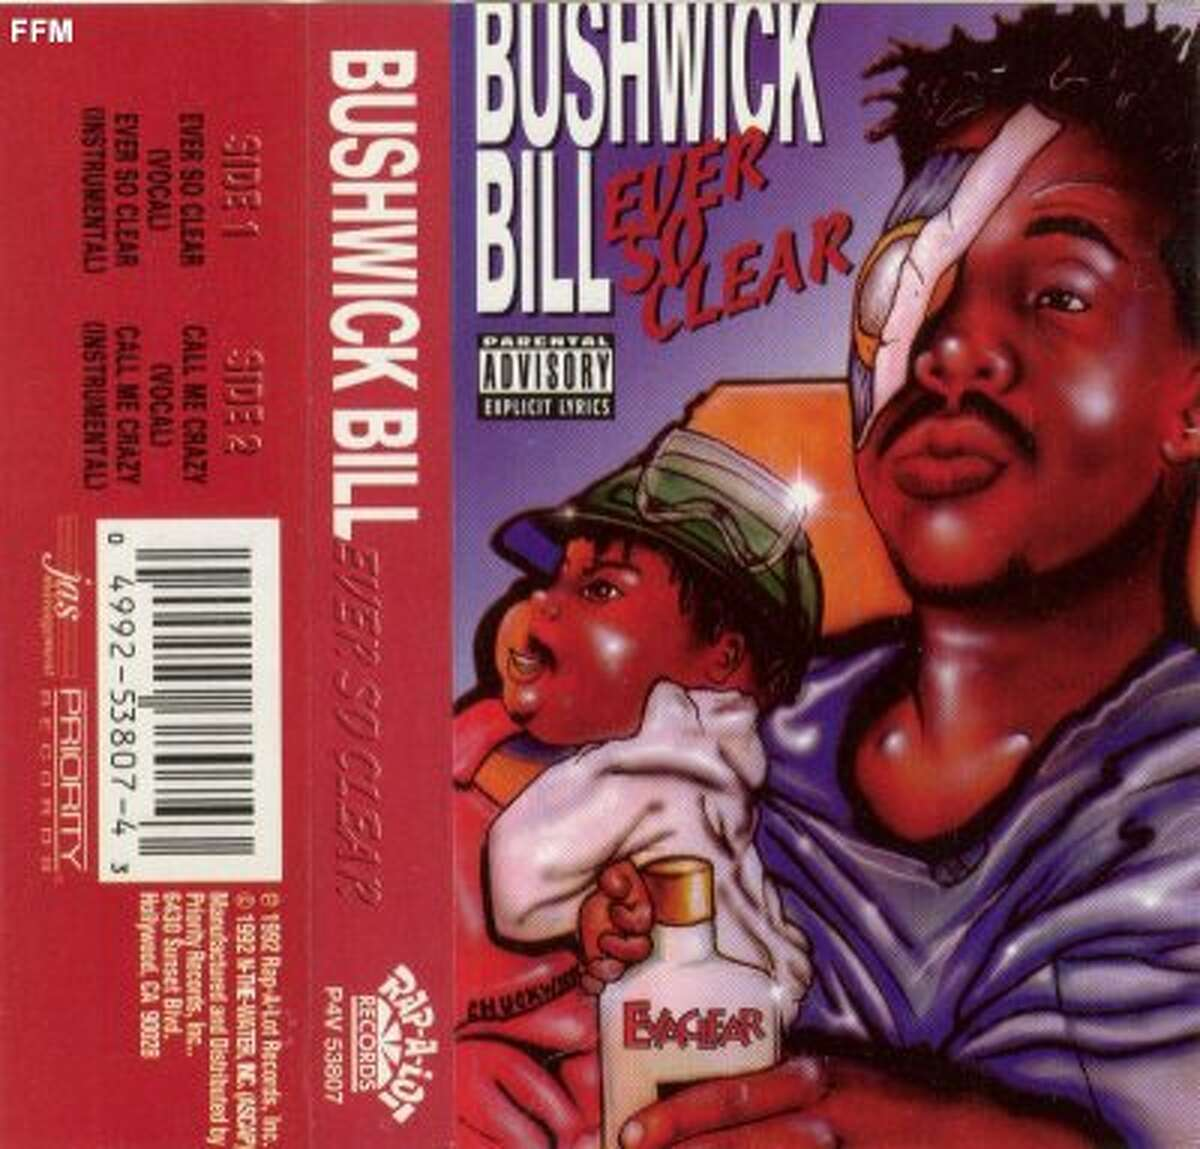 Bushwick Bill - Ever So Clear * single tape *.  1992, Rap-A-Lot Records Houston, Texas